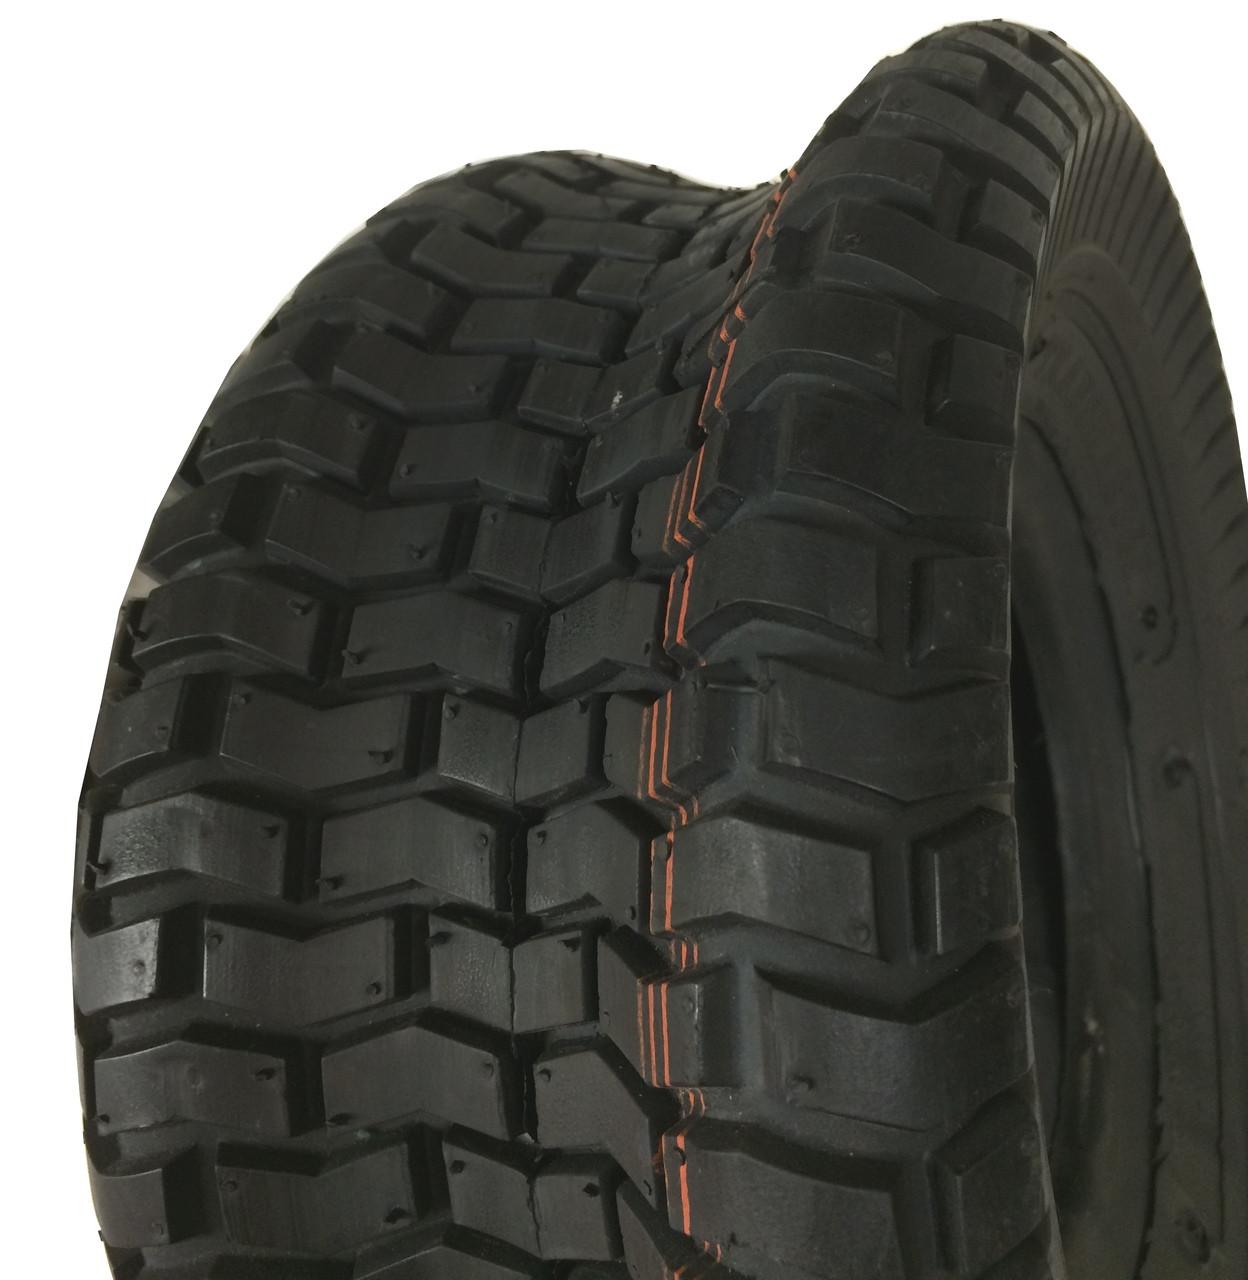 New Tire 11 4.00 5 Transmaster Turf 4 Ply Mower 11x4.00-5